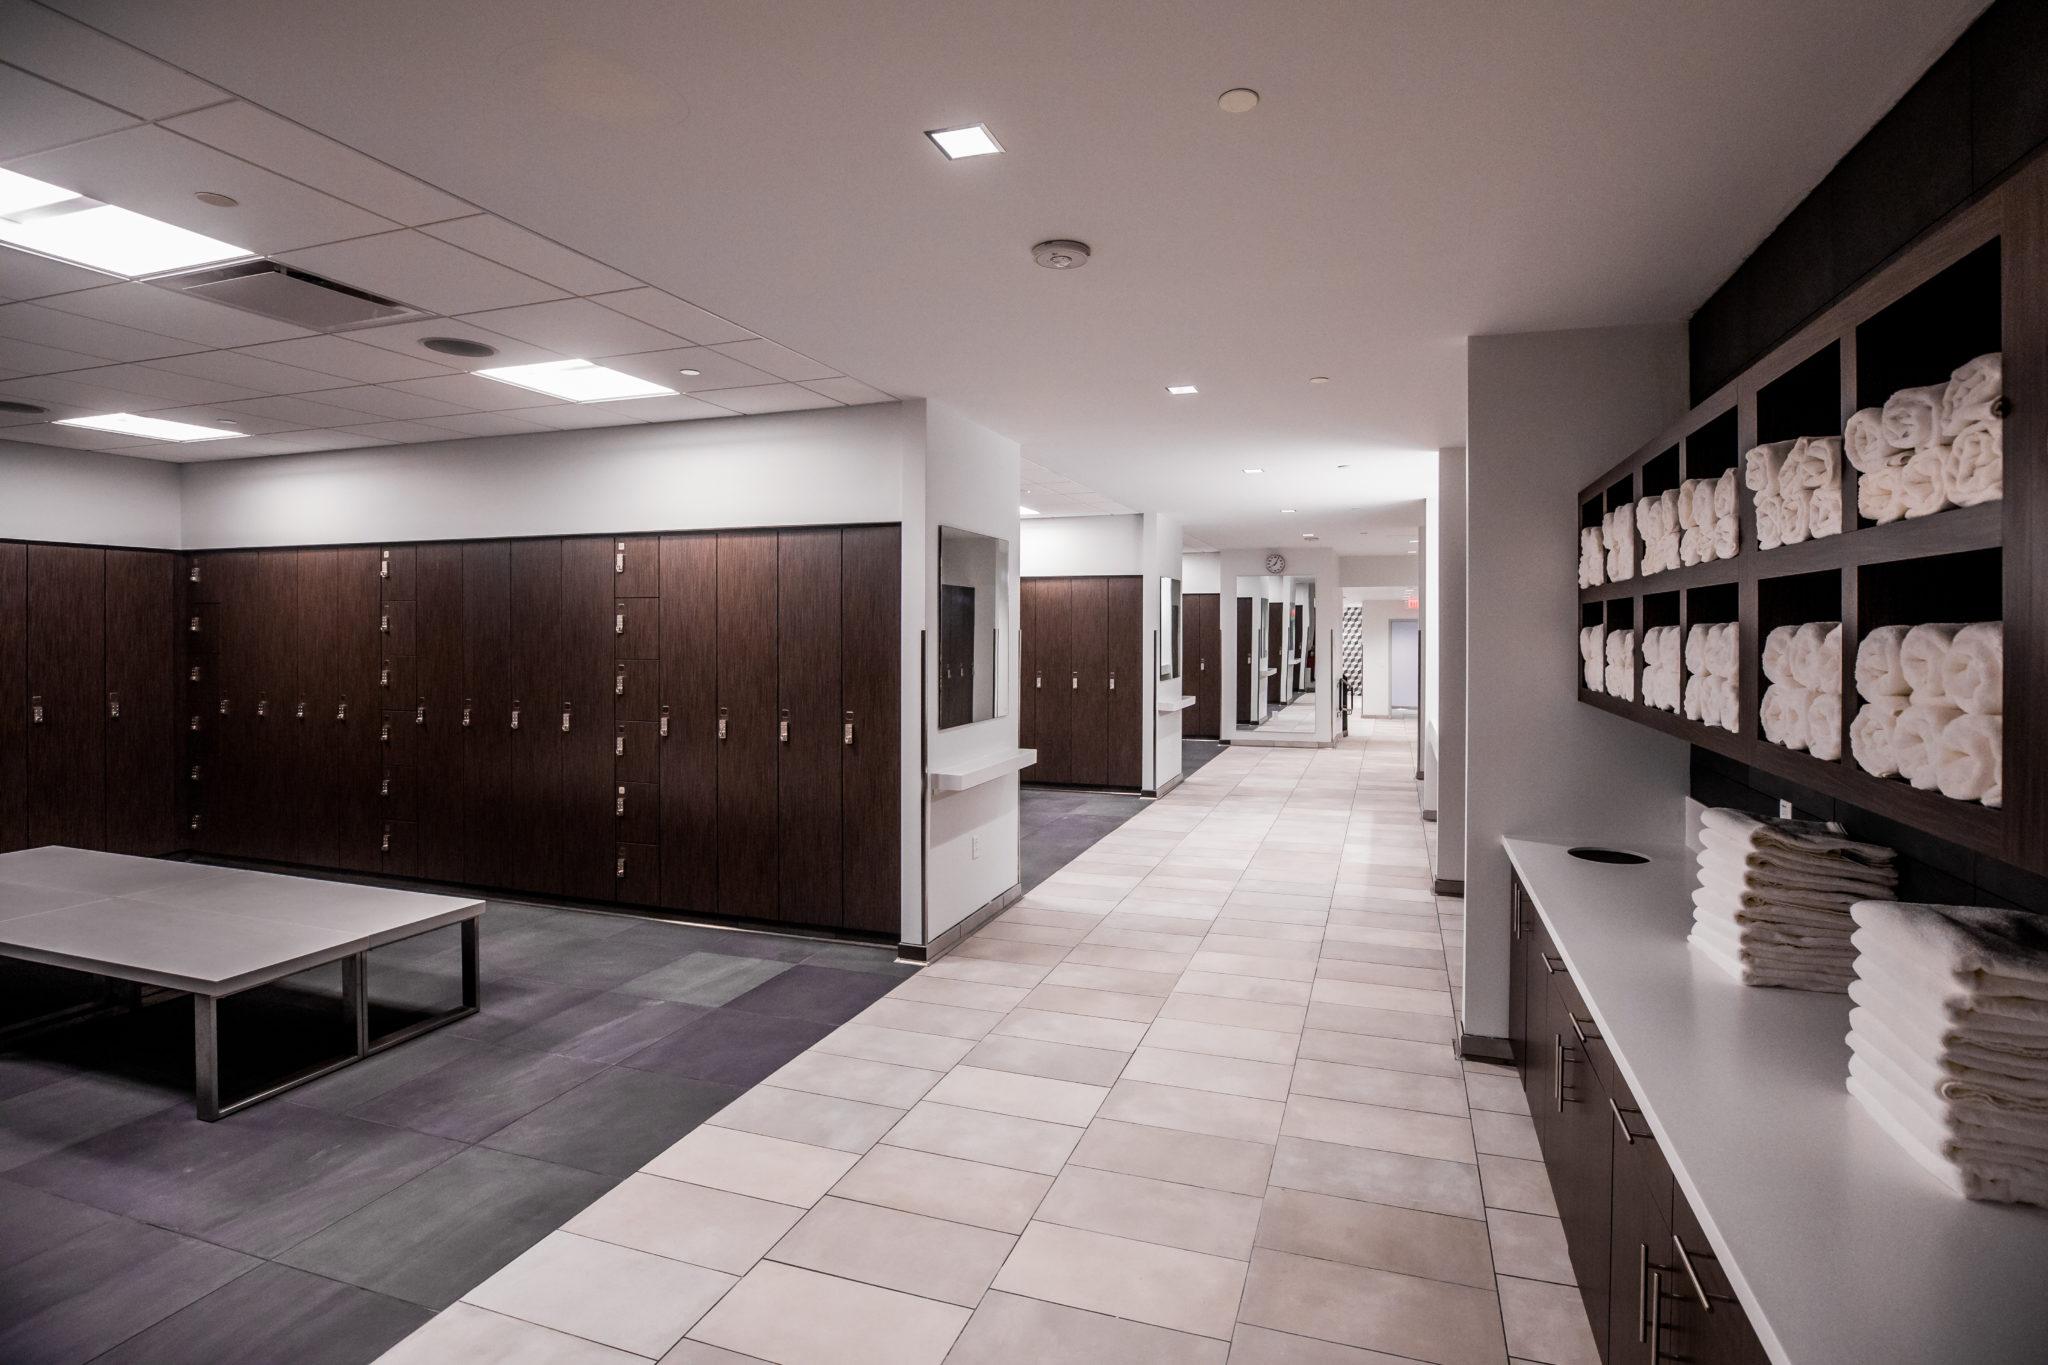 Warrior ice arena boston landing - Interior design schools in boston ...